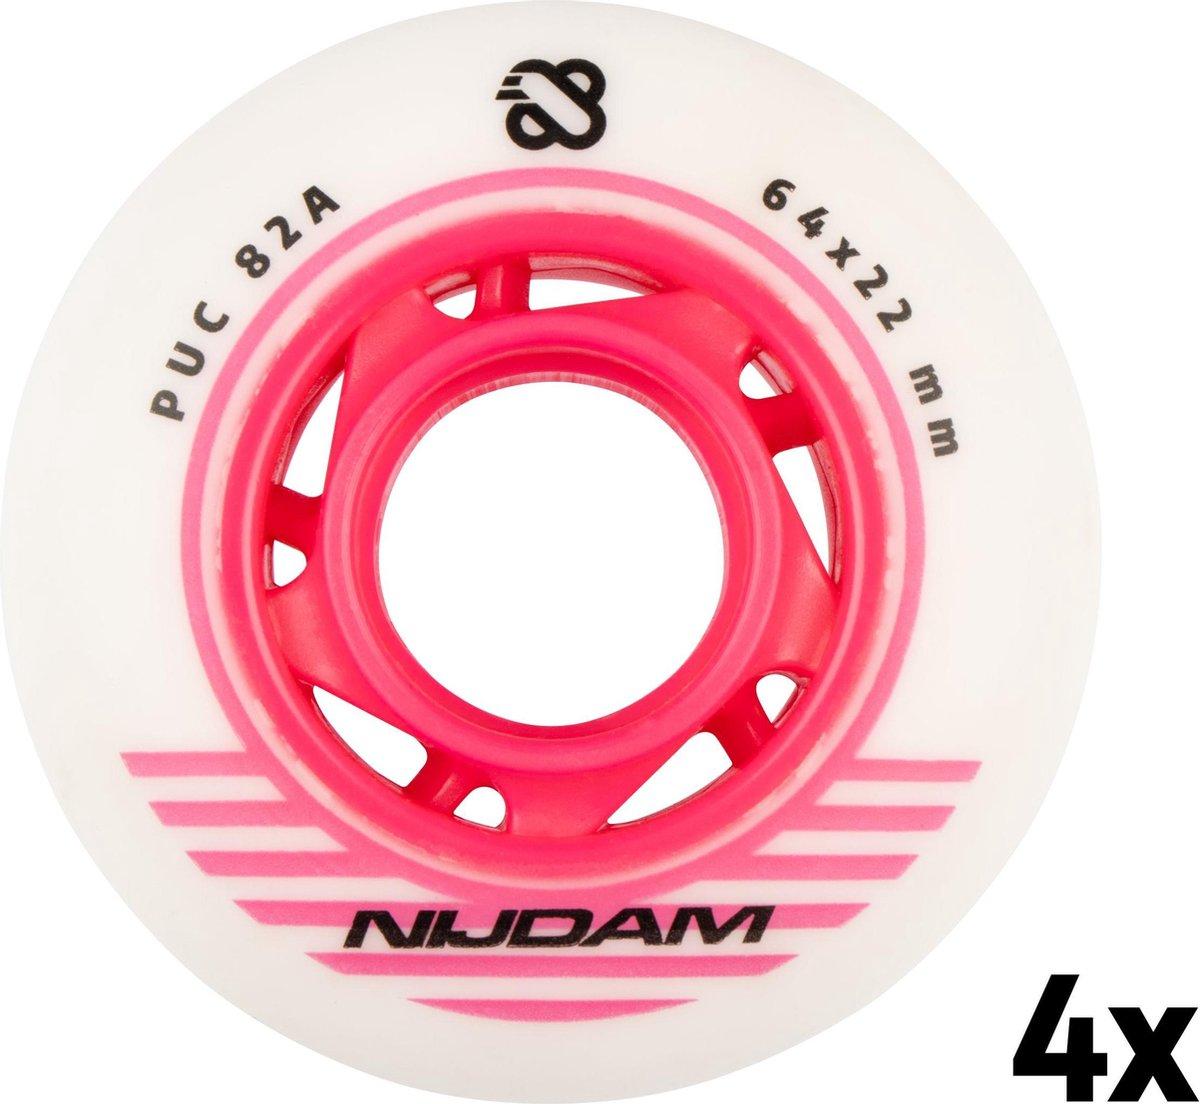 Nijdam Inline Skate Wielen Set - 64x22 mm - 4st - White - Wit/Roze/Zwart